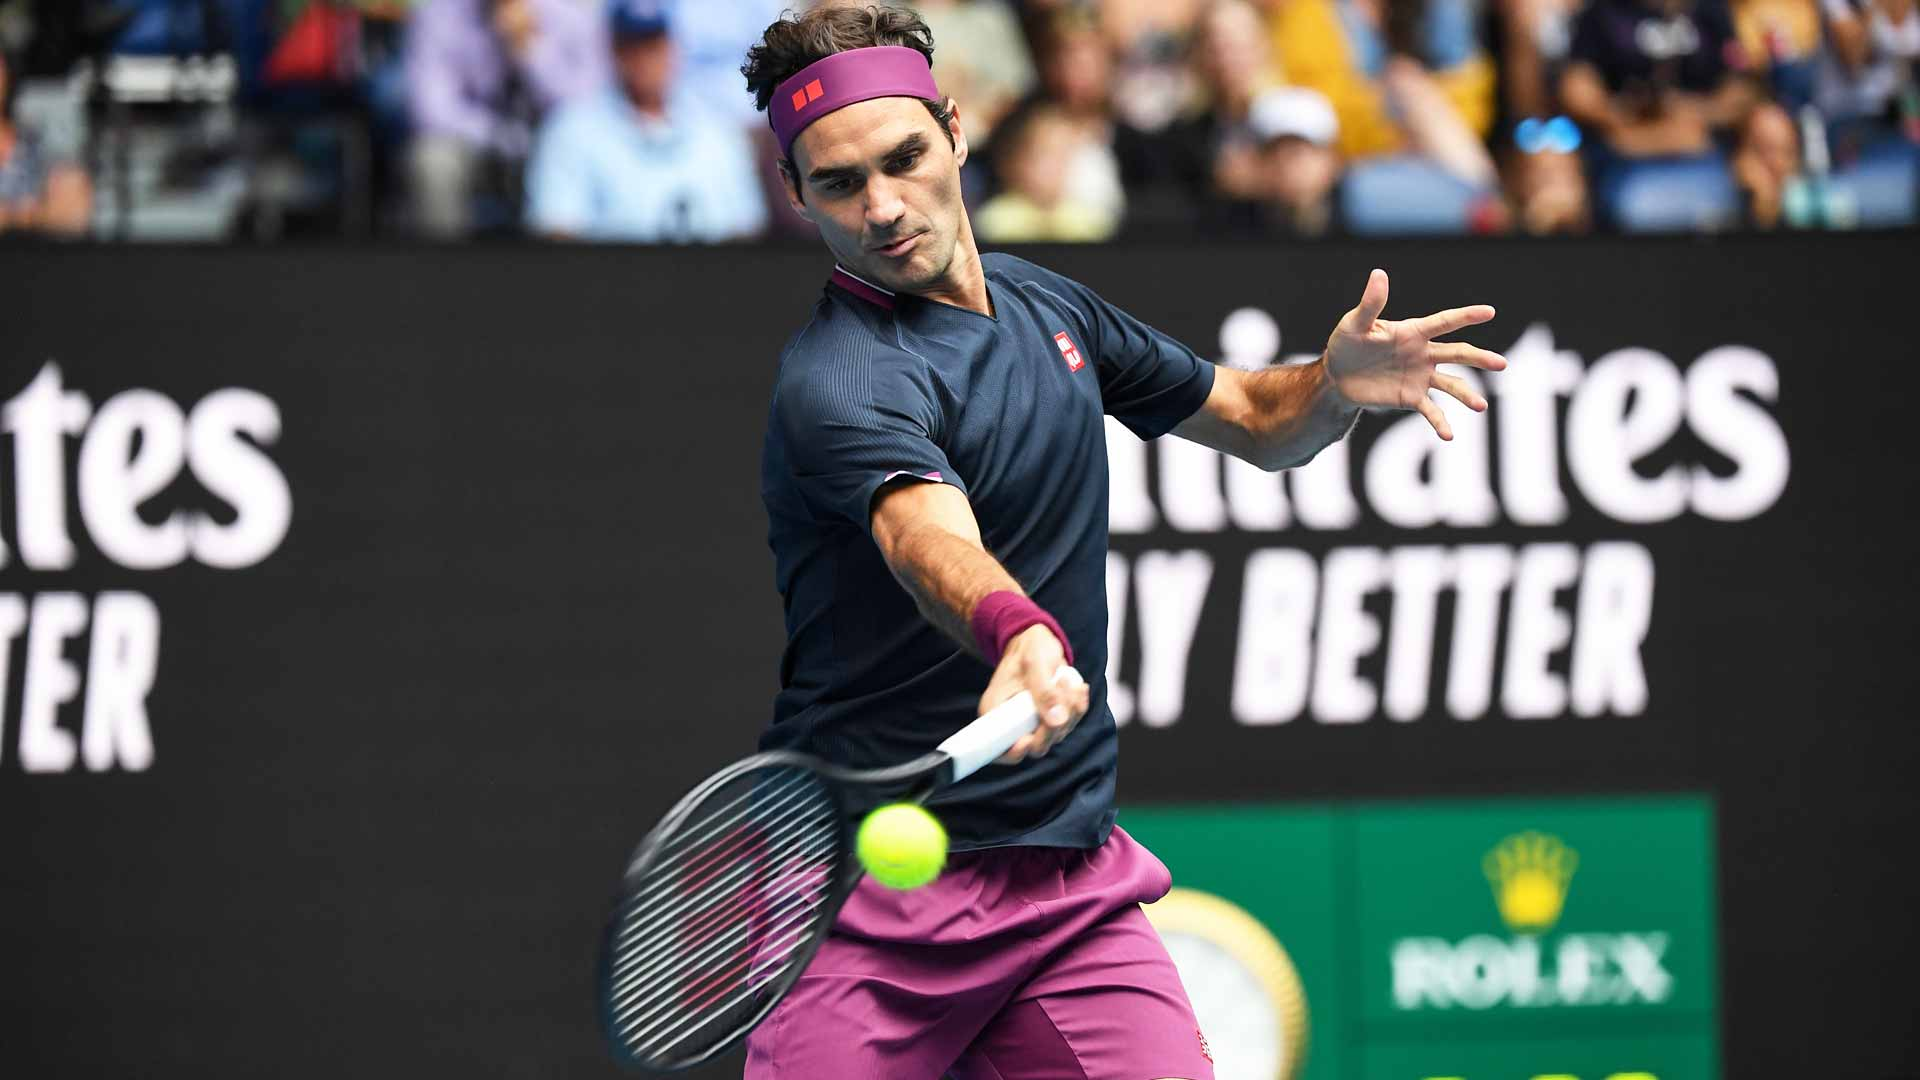 Federer 2020 <a href='https://www.atptour.com/en/tournaments/australian-open/580/overview'>Australian Open</a> Monday